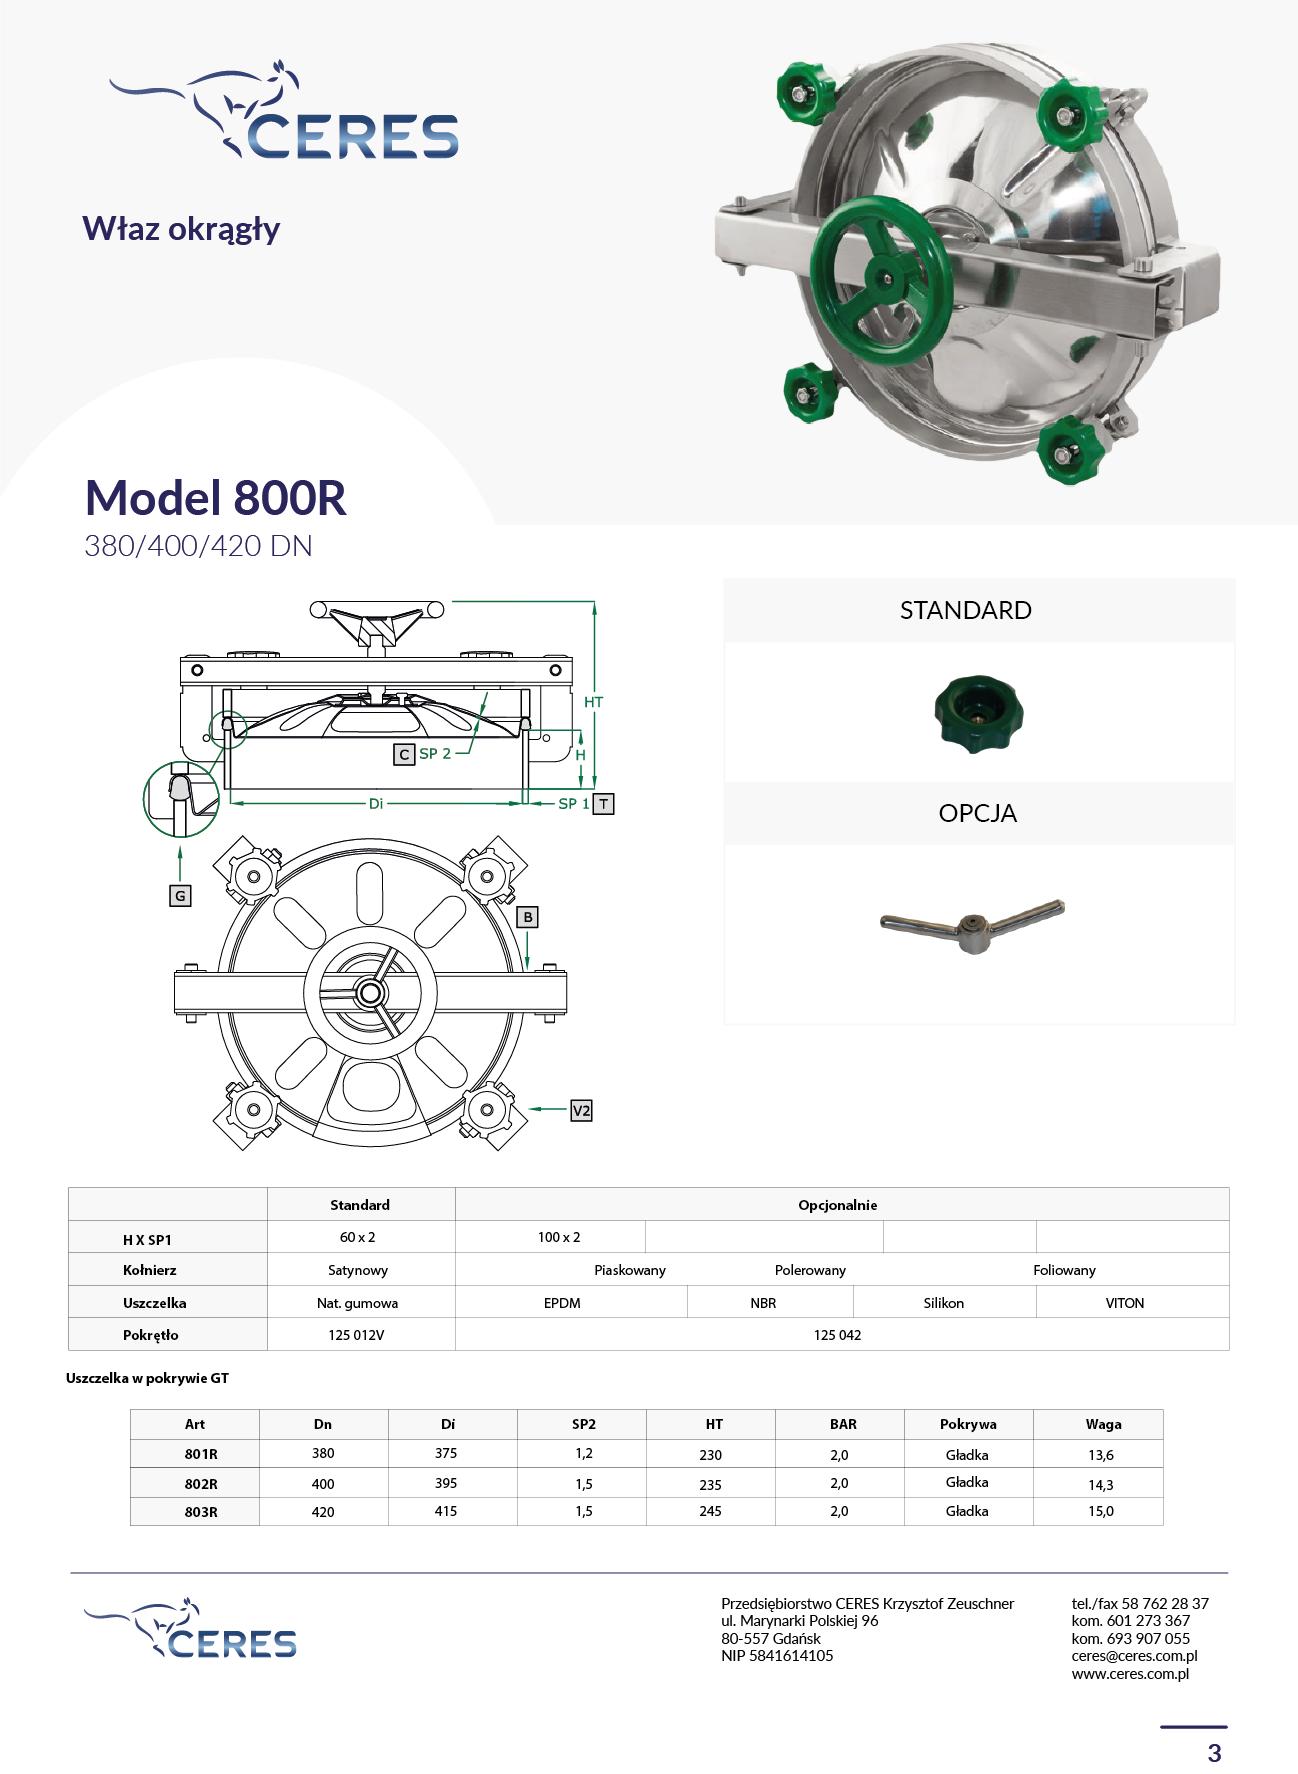 MODEL 800R